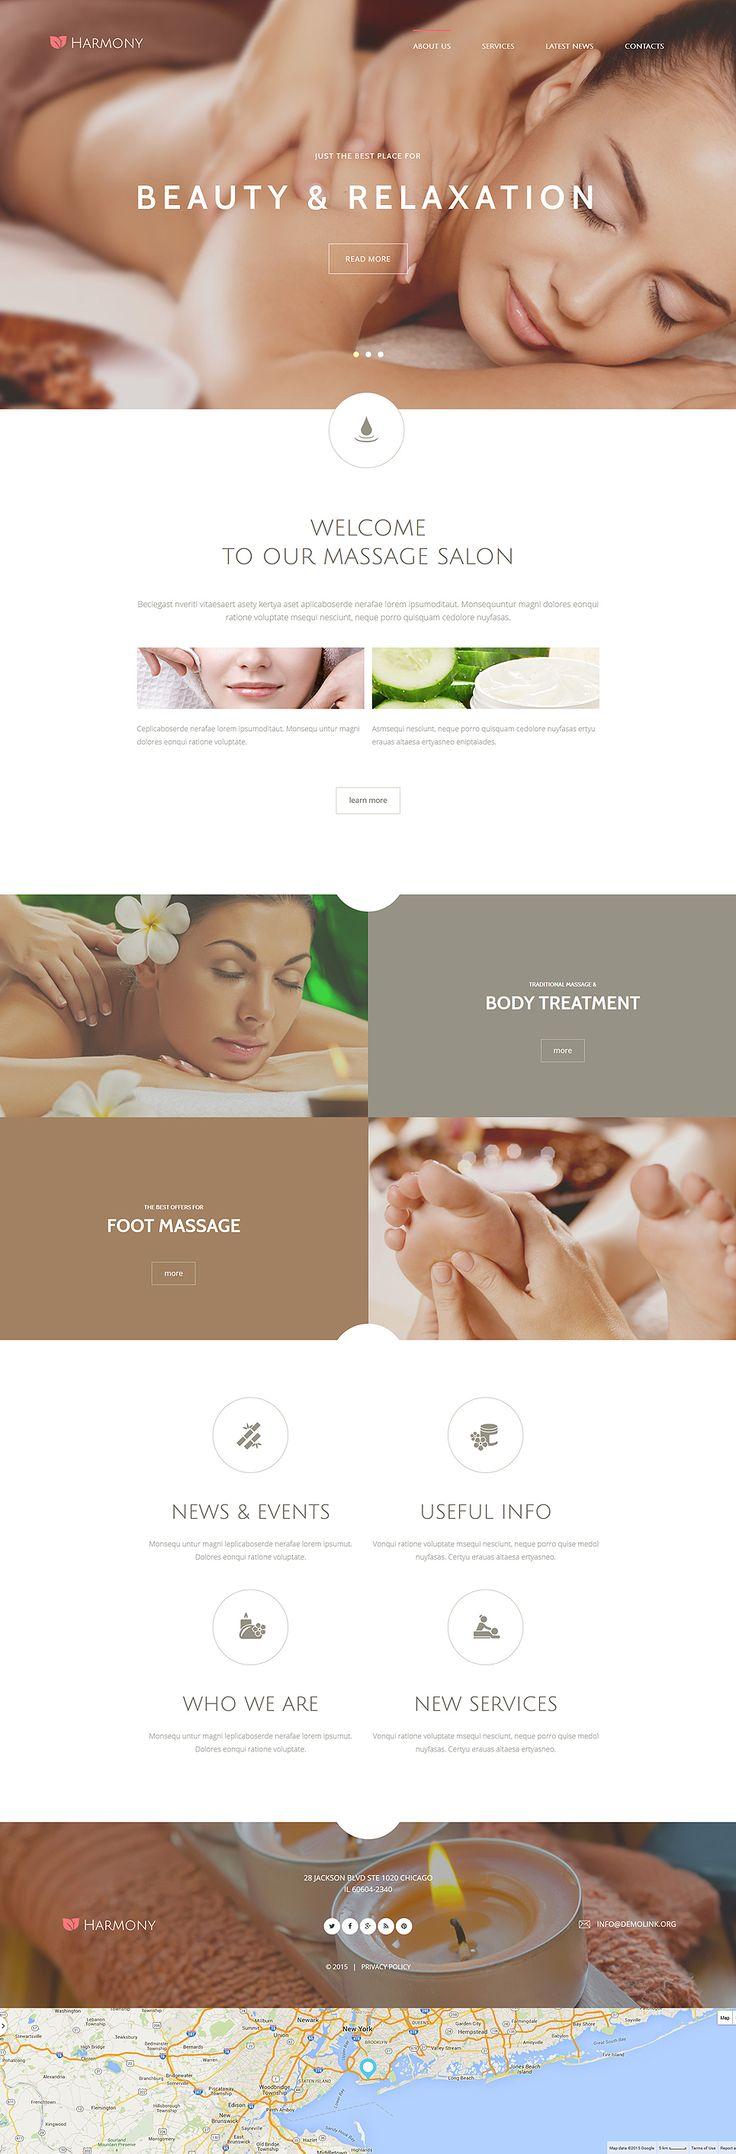 Harmony Joomla Template Spa BrochureSpa WebsiteWebsite